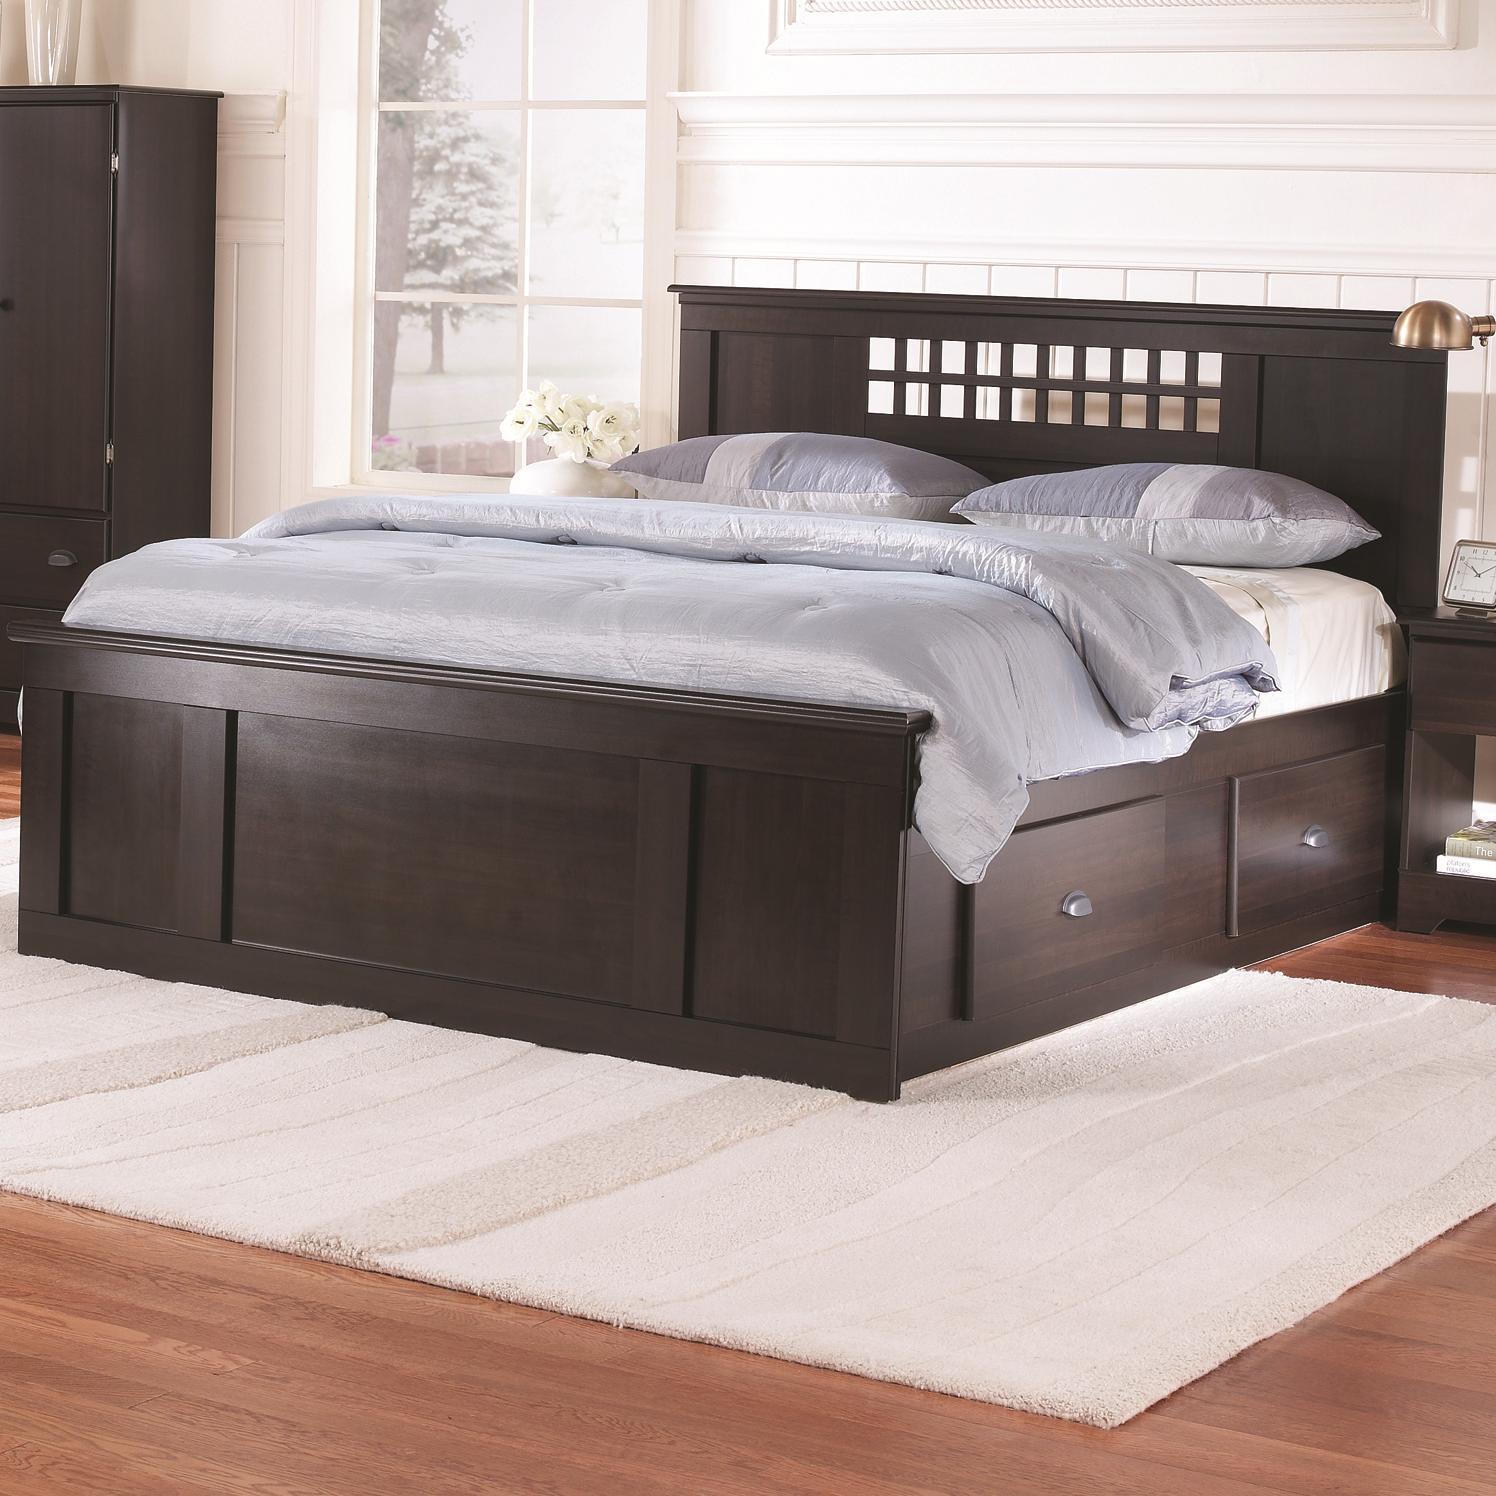 A1 Furniture Mattress Princess Night: Lang Bayfield Full Panel Captains Bed